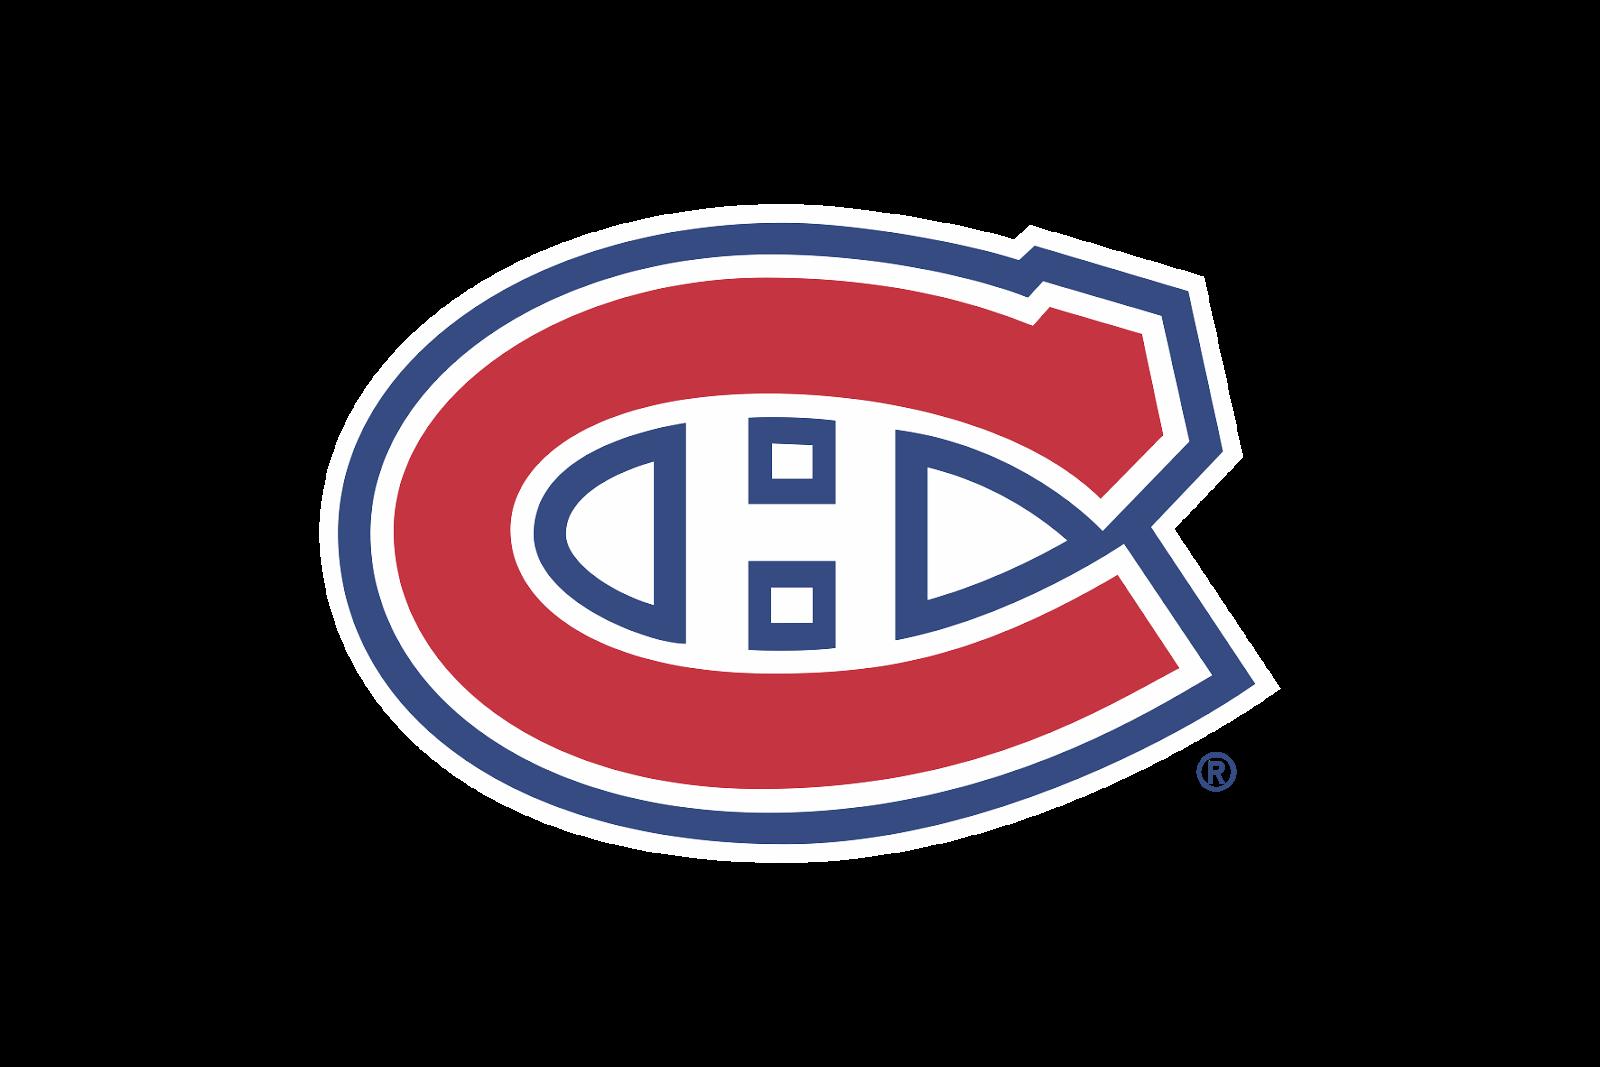 Montreal canadiens logo logo share - Montreal canadians logo ...